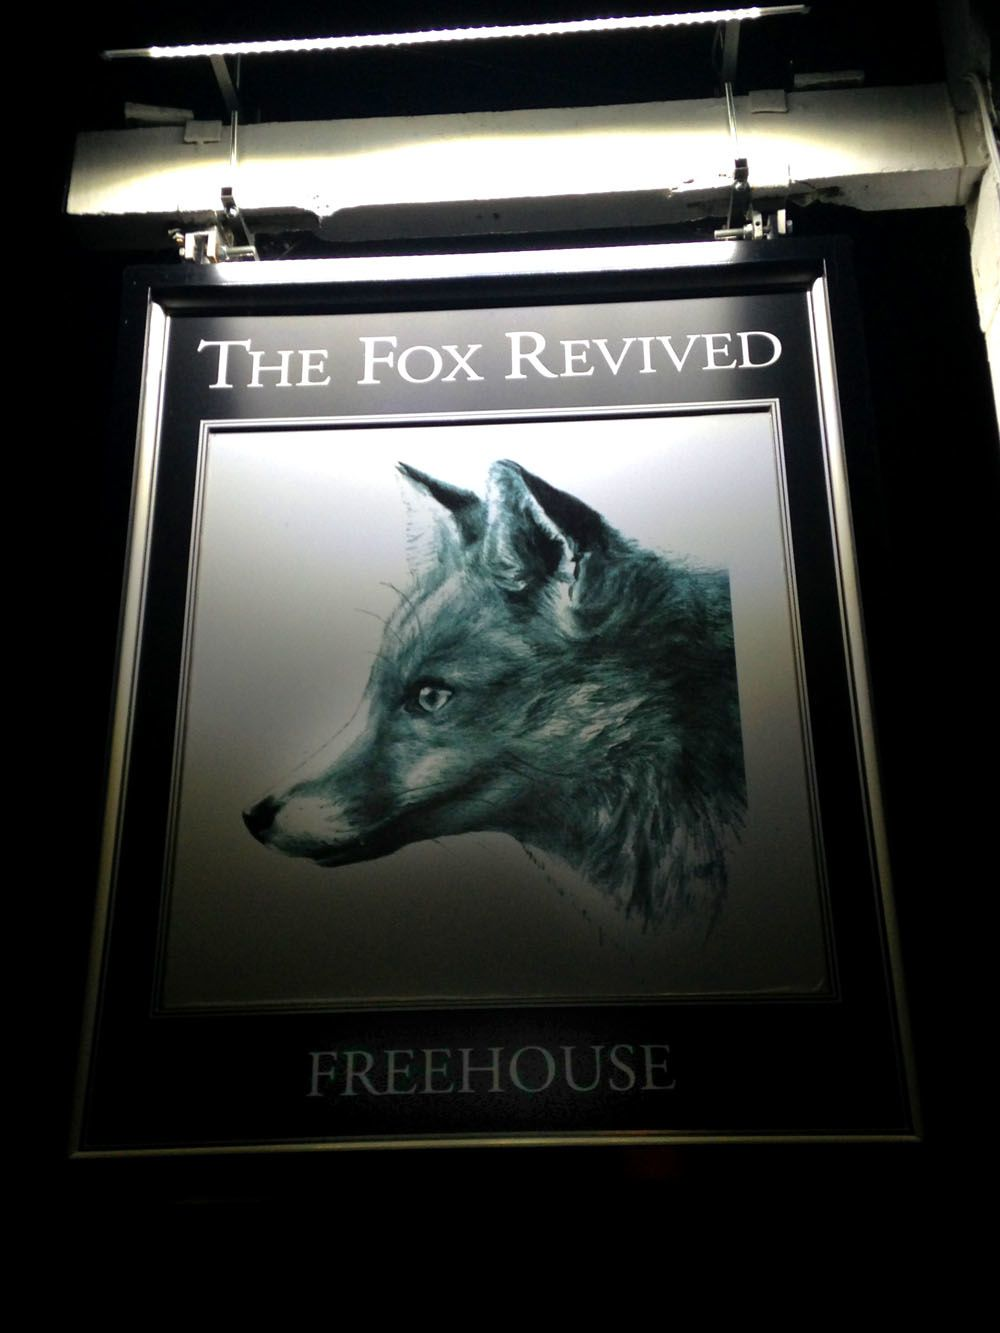 Week-end en Angleterre... The Fox Revived